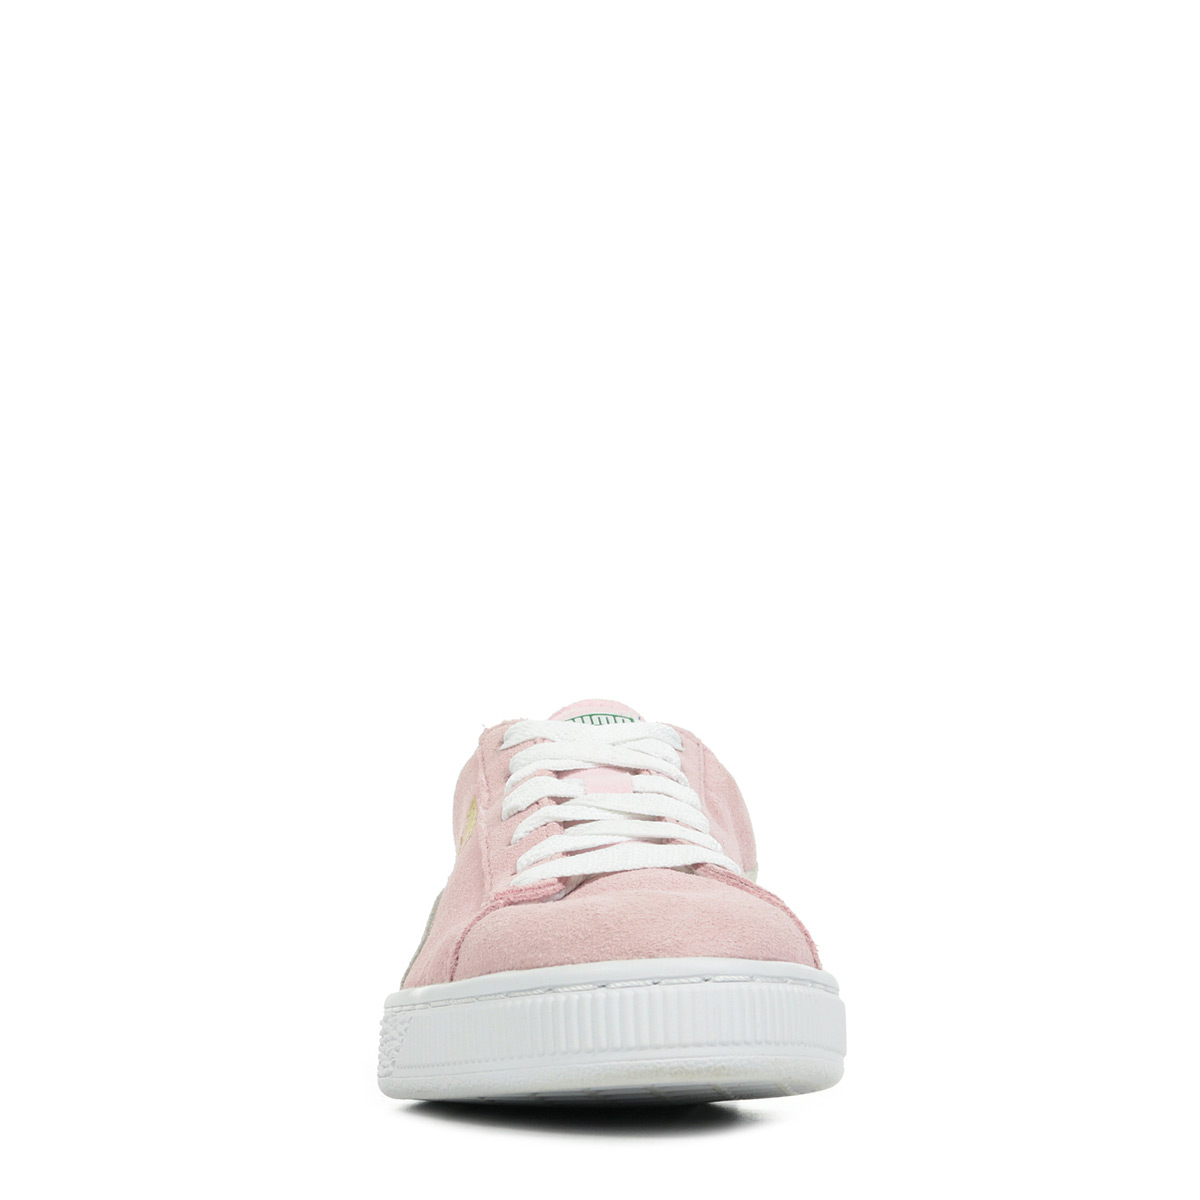 Puma Suede Jr 35511030, Baskets mode fille